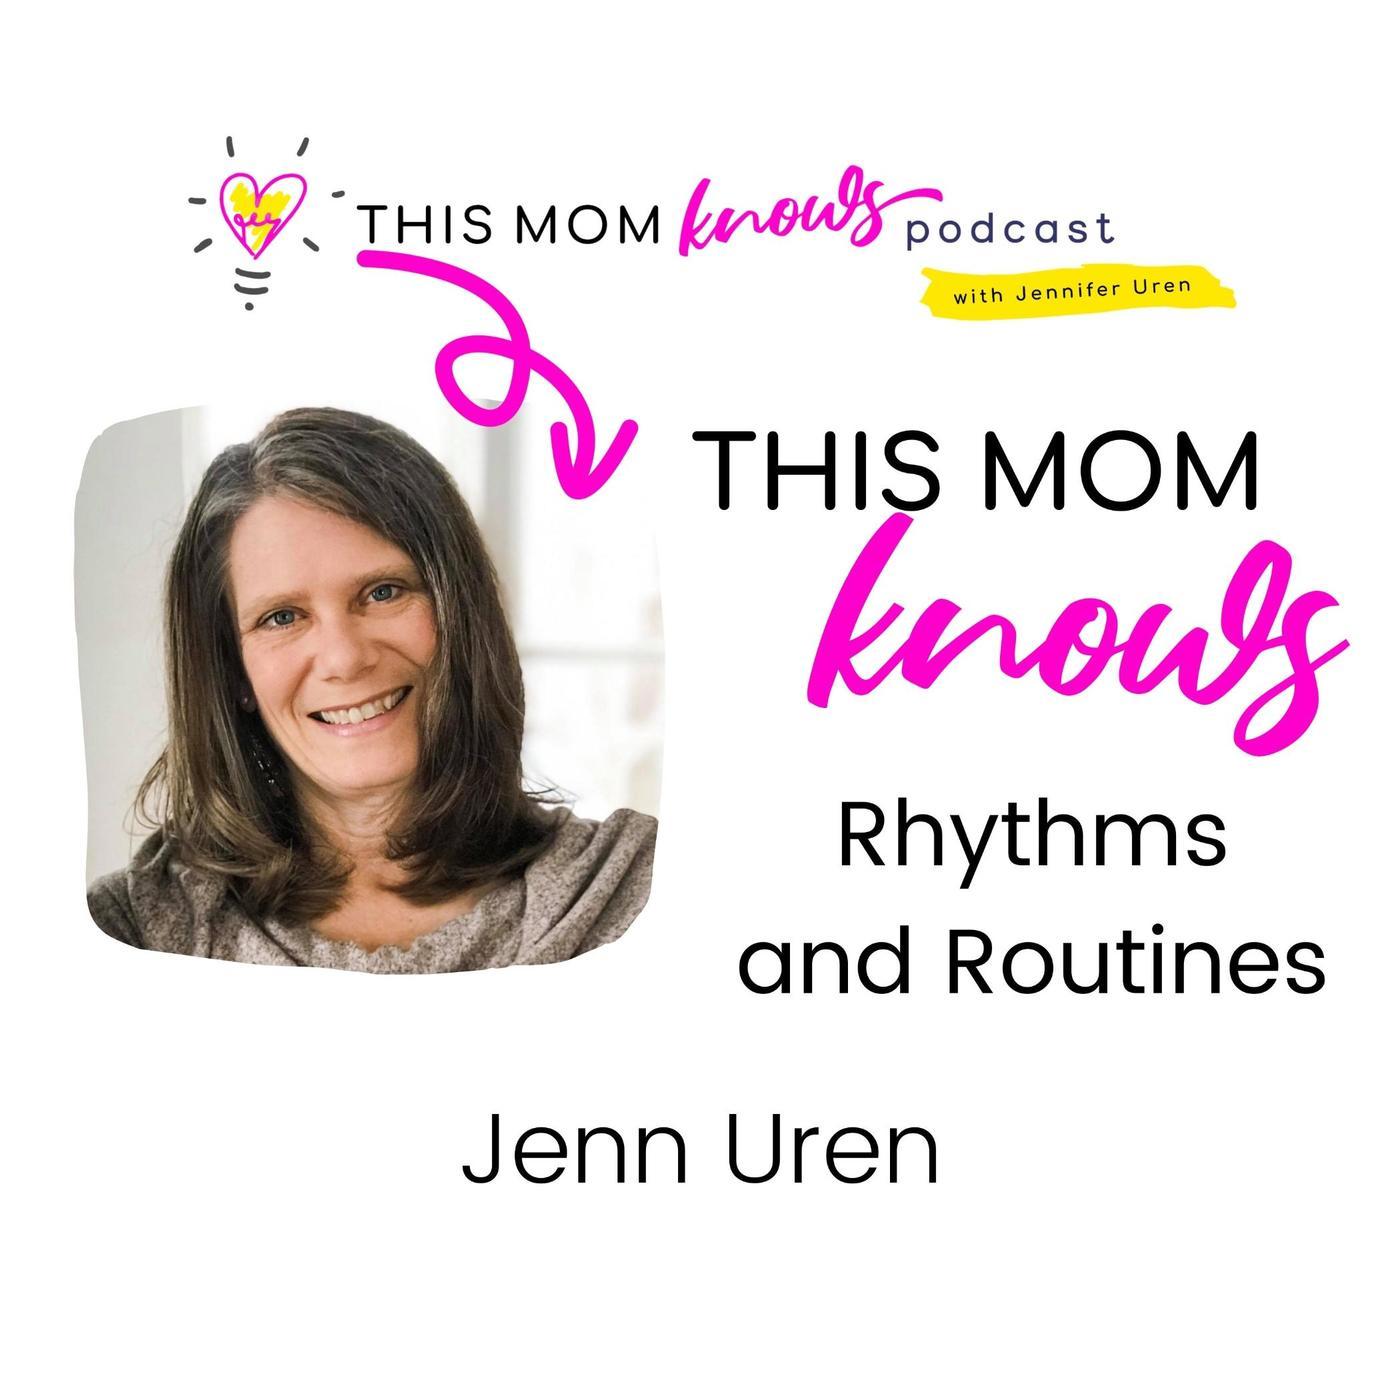 Jenn Uren on Rhythms and Routines